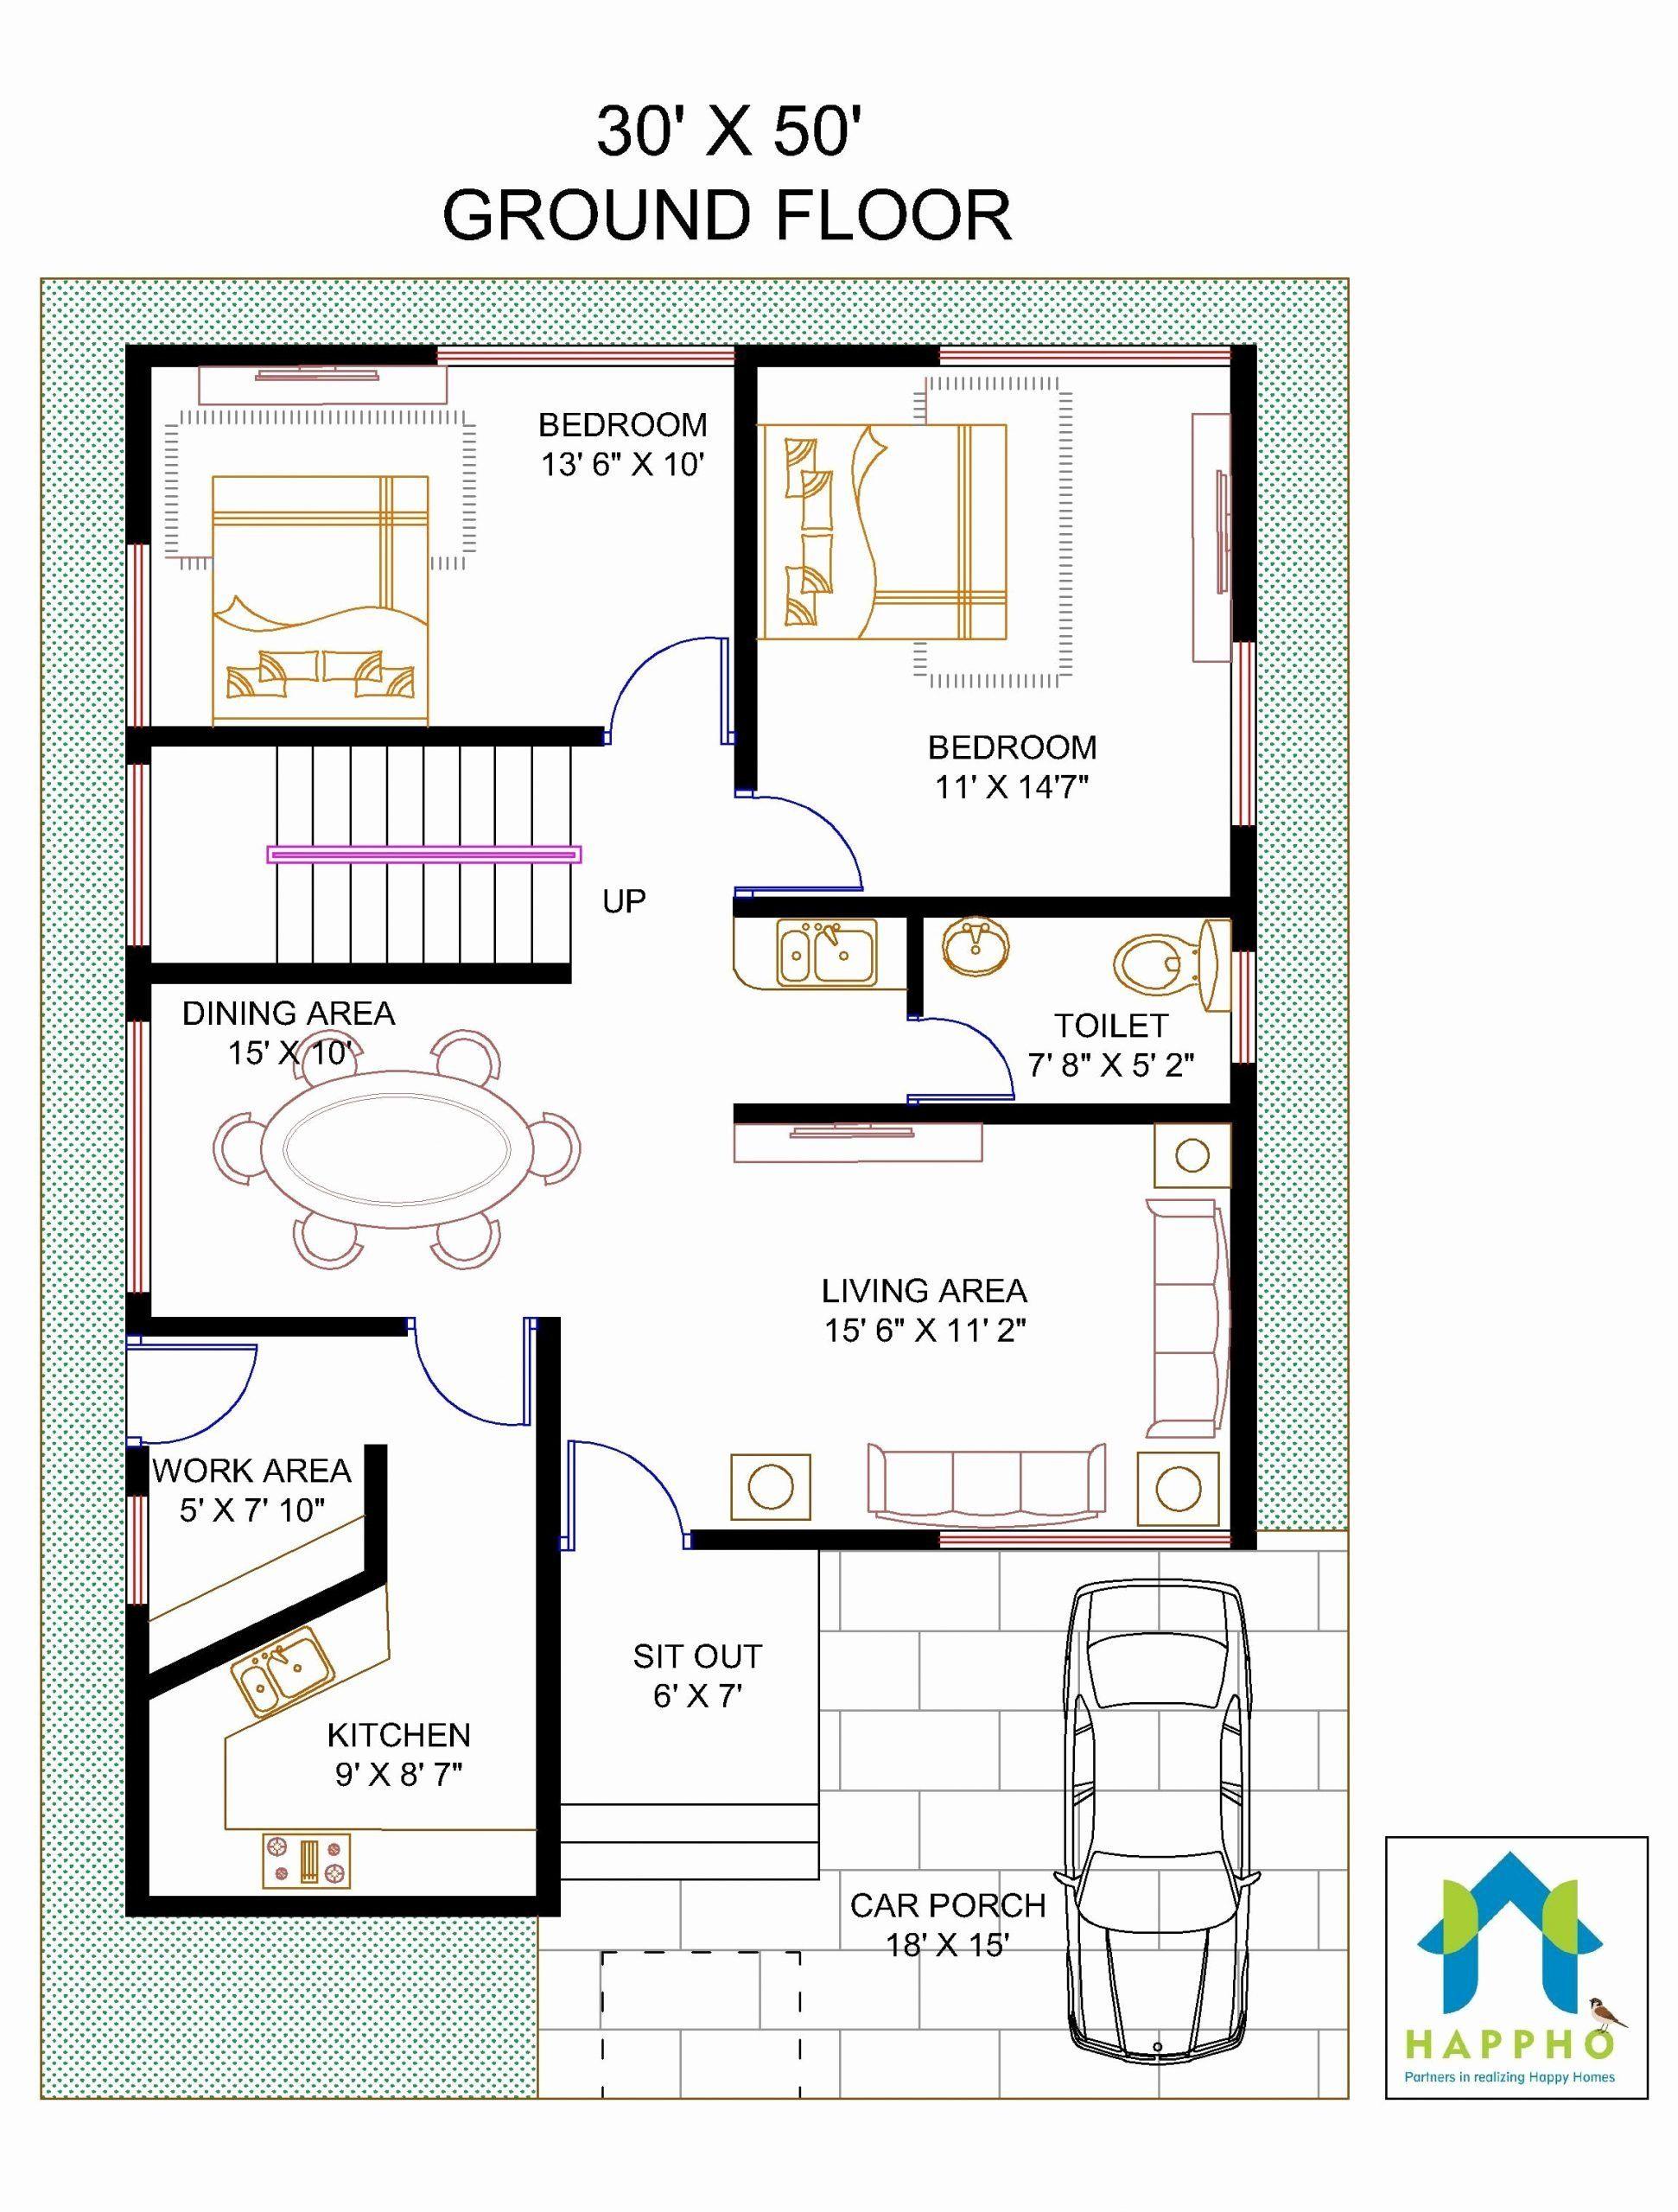 1600 Sf House Plans Inspirational Floor Plan For 30 X 50 Feet Plot In 2020 Duplex Floor Plans Floor Plans Unique Floor Plans